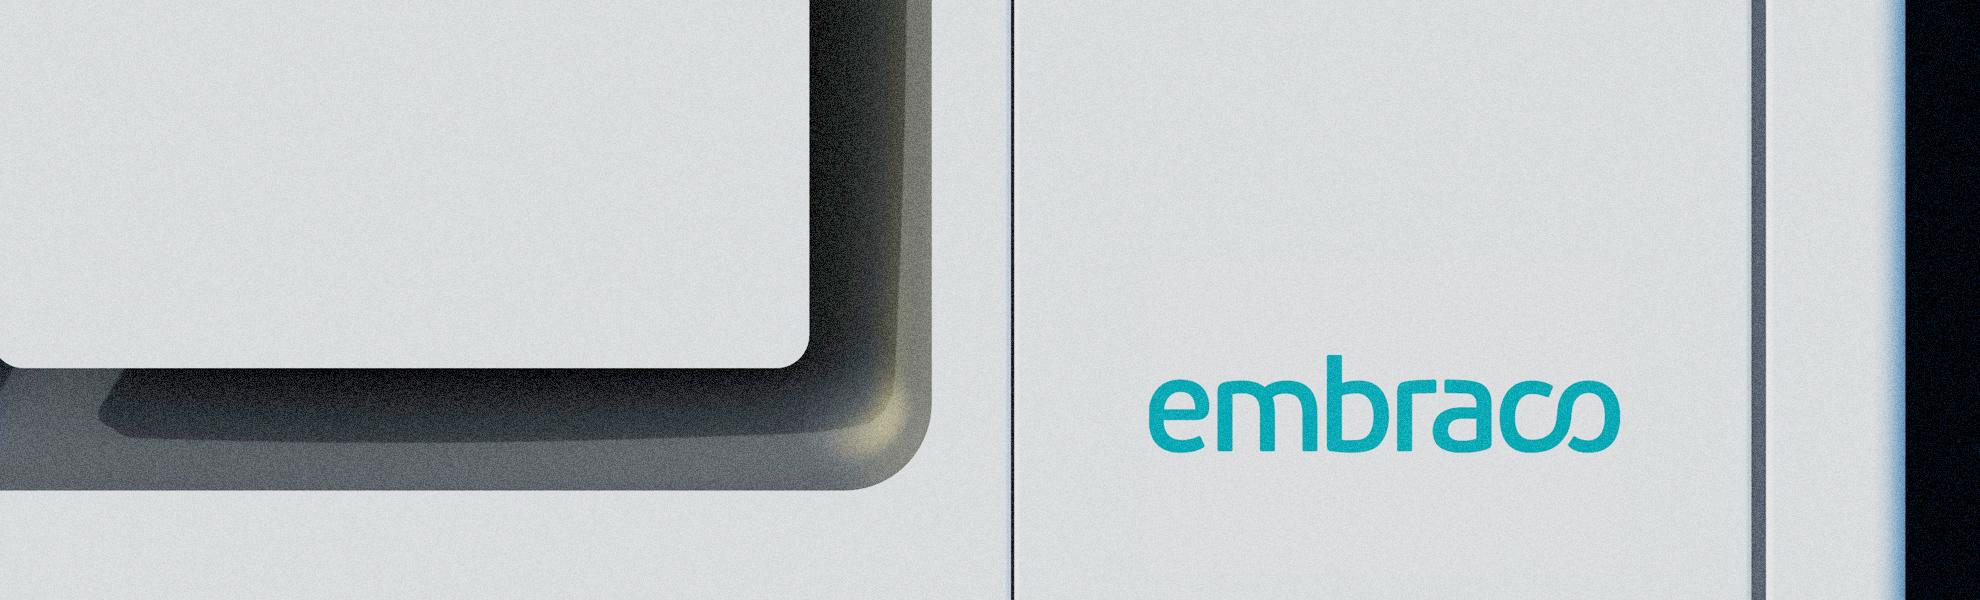 chelles-e-hayashi-design-portfolio-embraco-europa-condensadora-bioma-sustentabilidade-produto